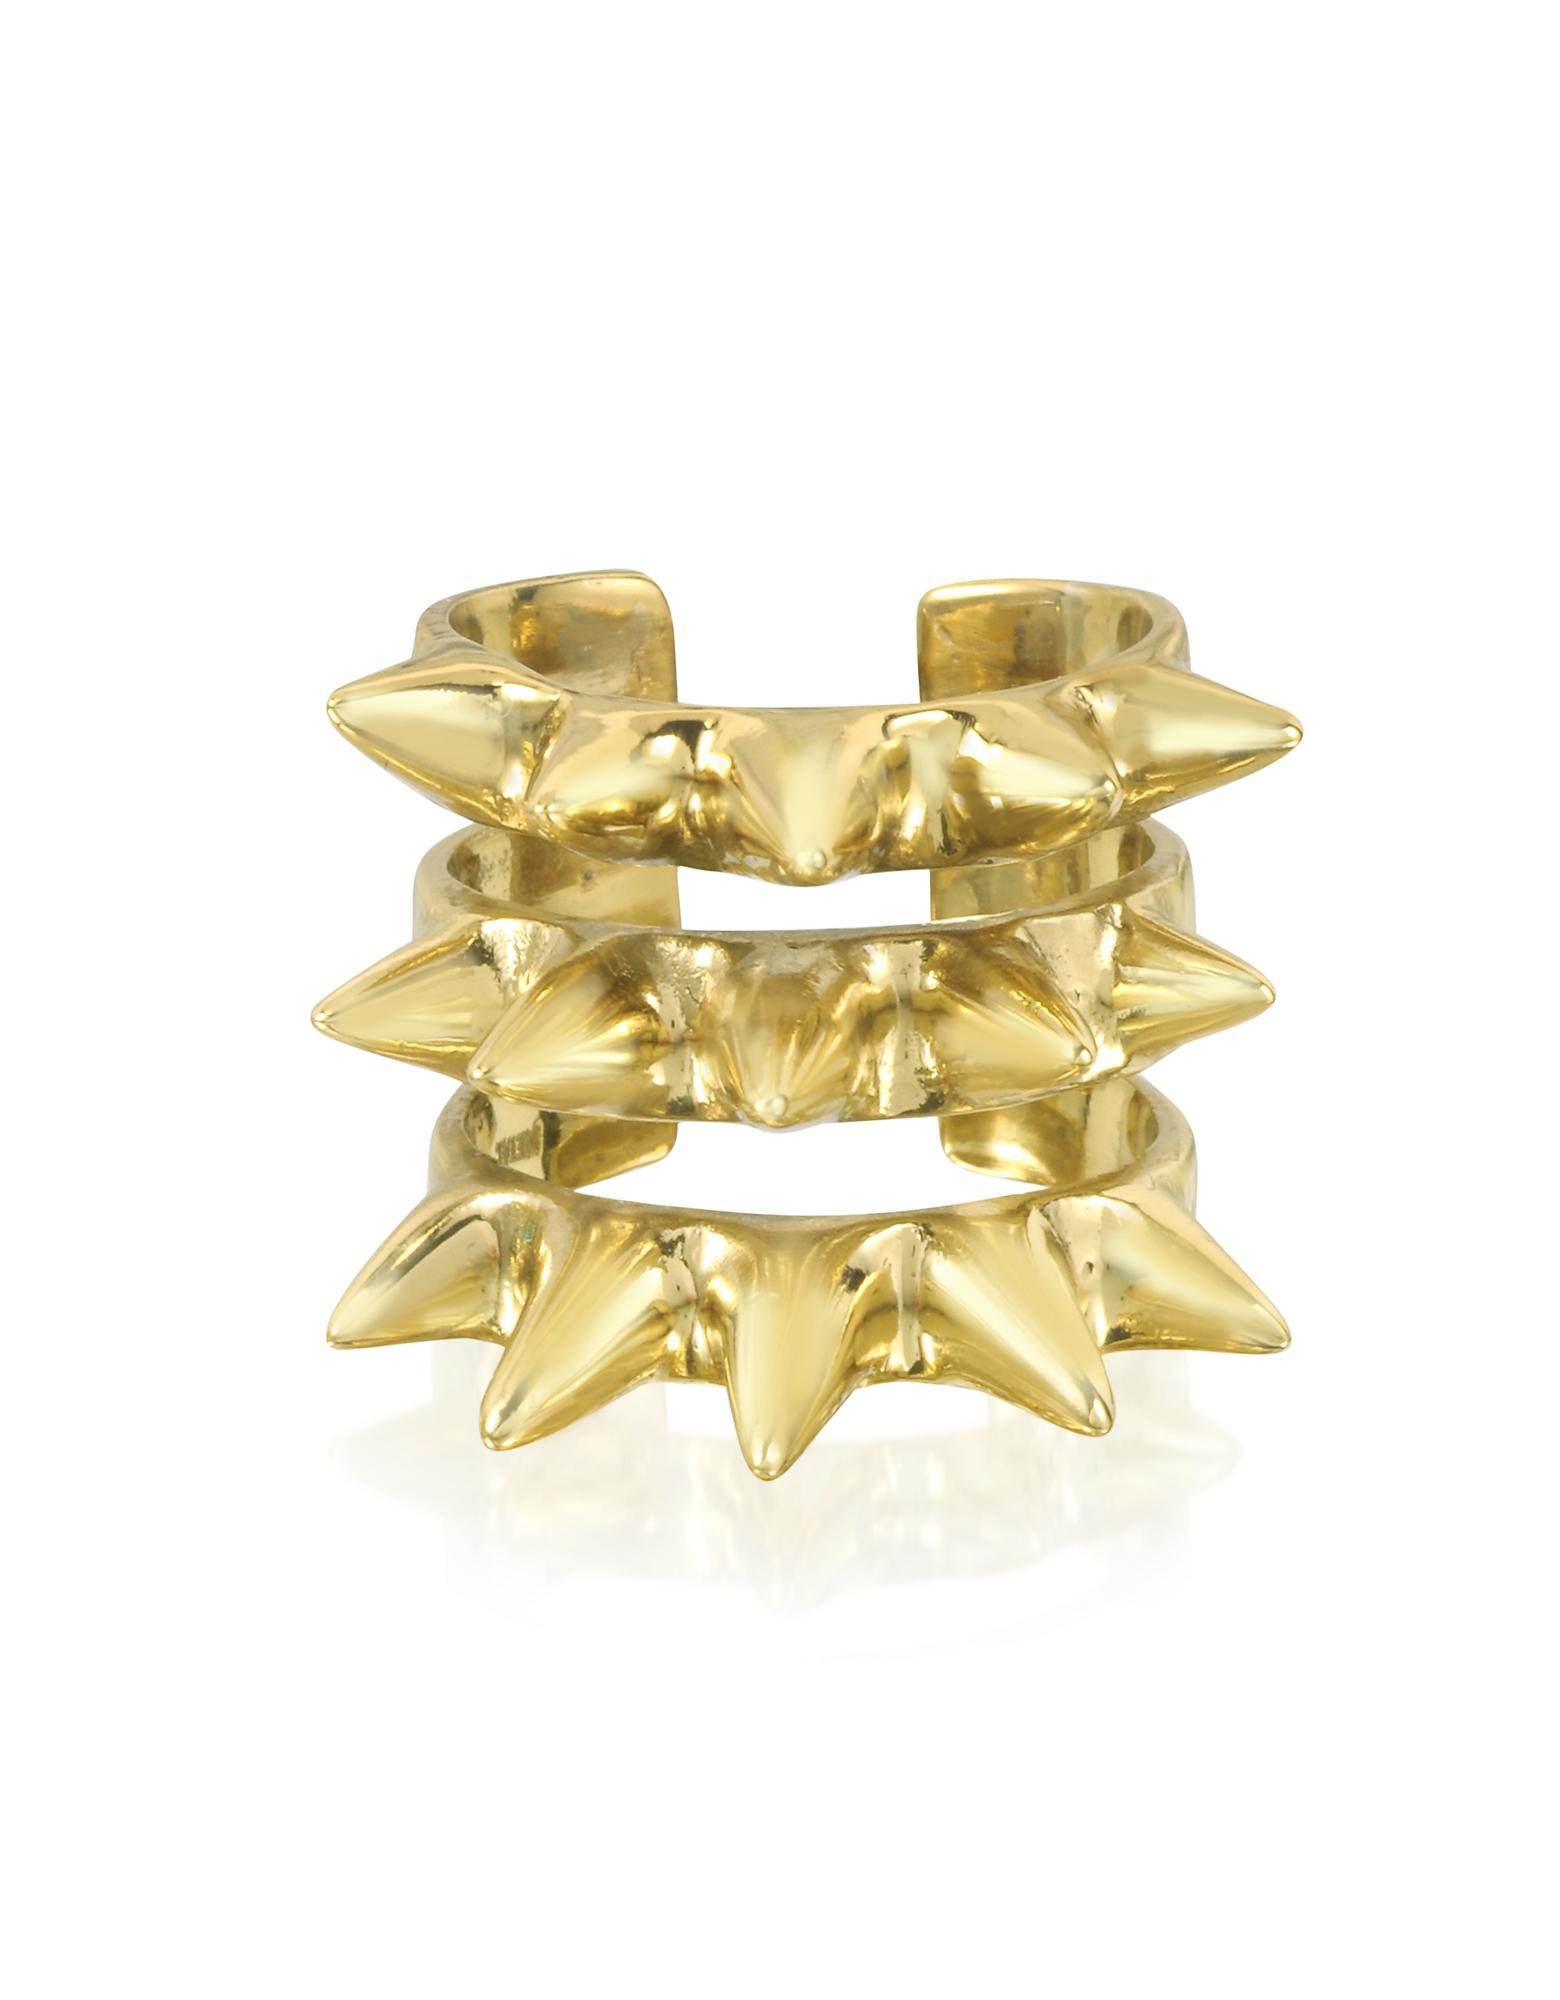 Bernard Delettrez Rings, Triple Band Bronze Ring w/Spikes